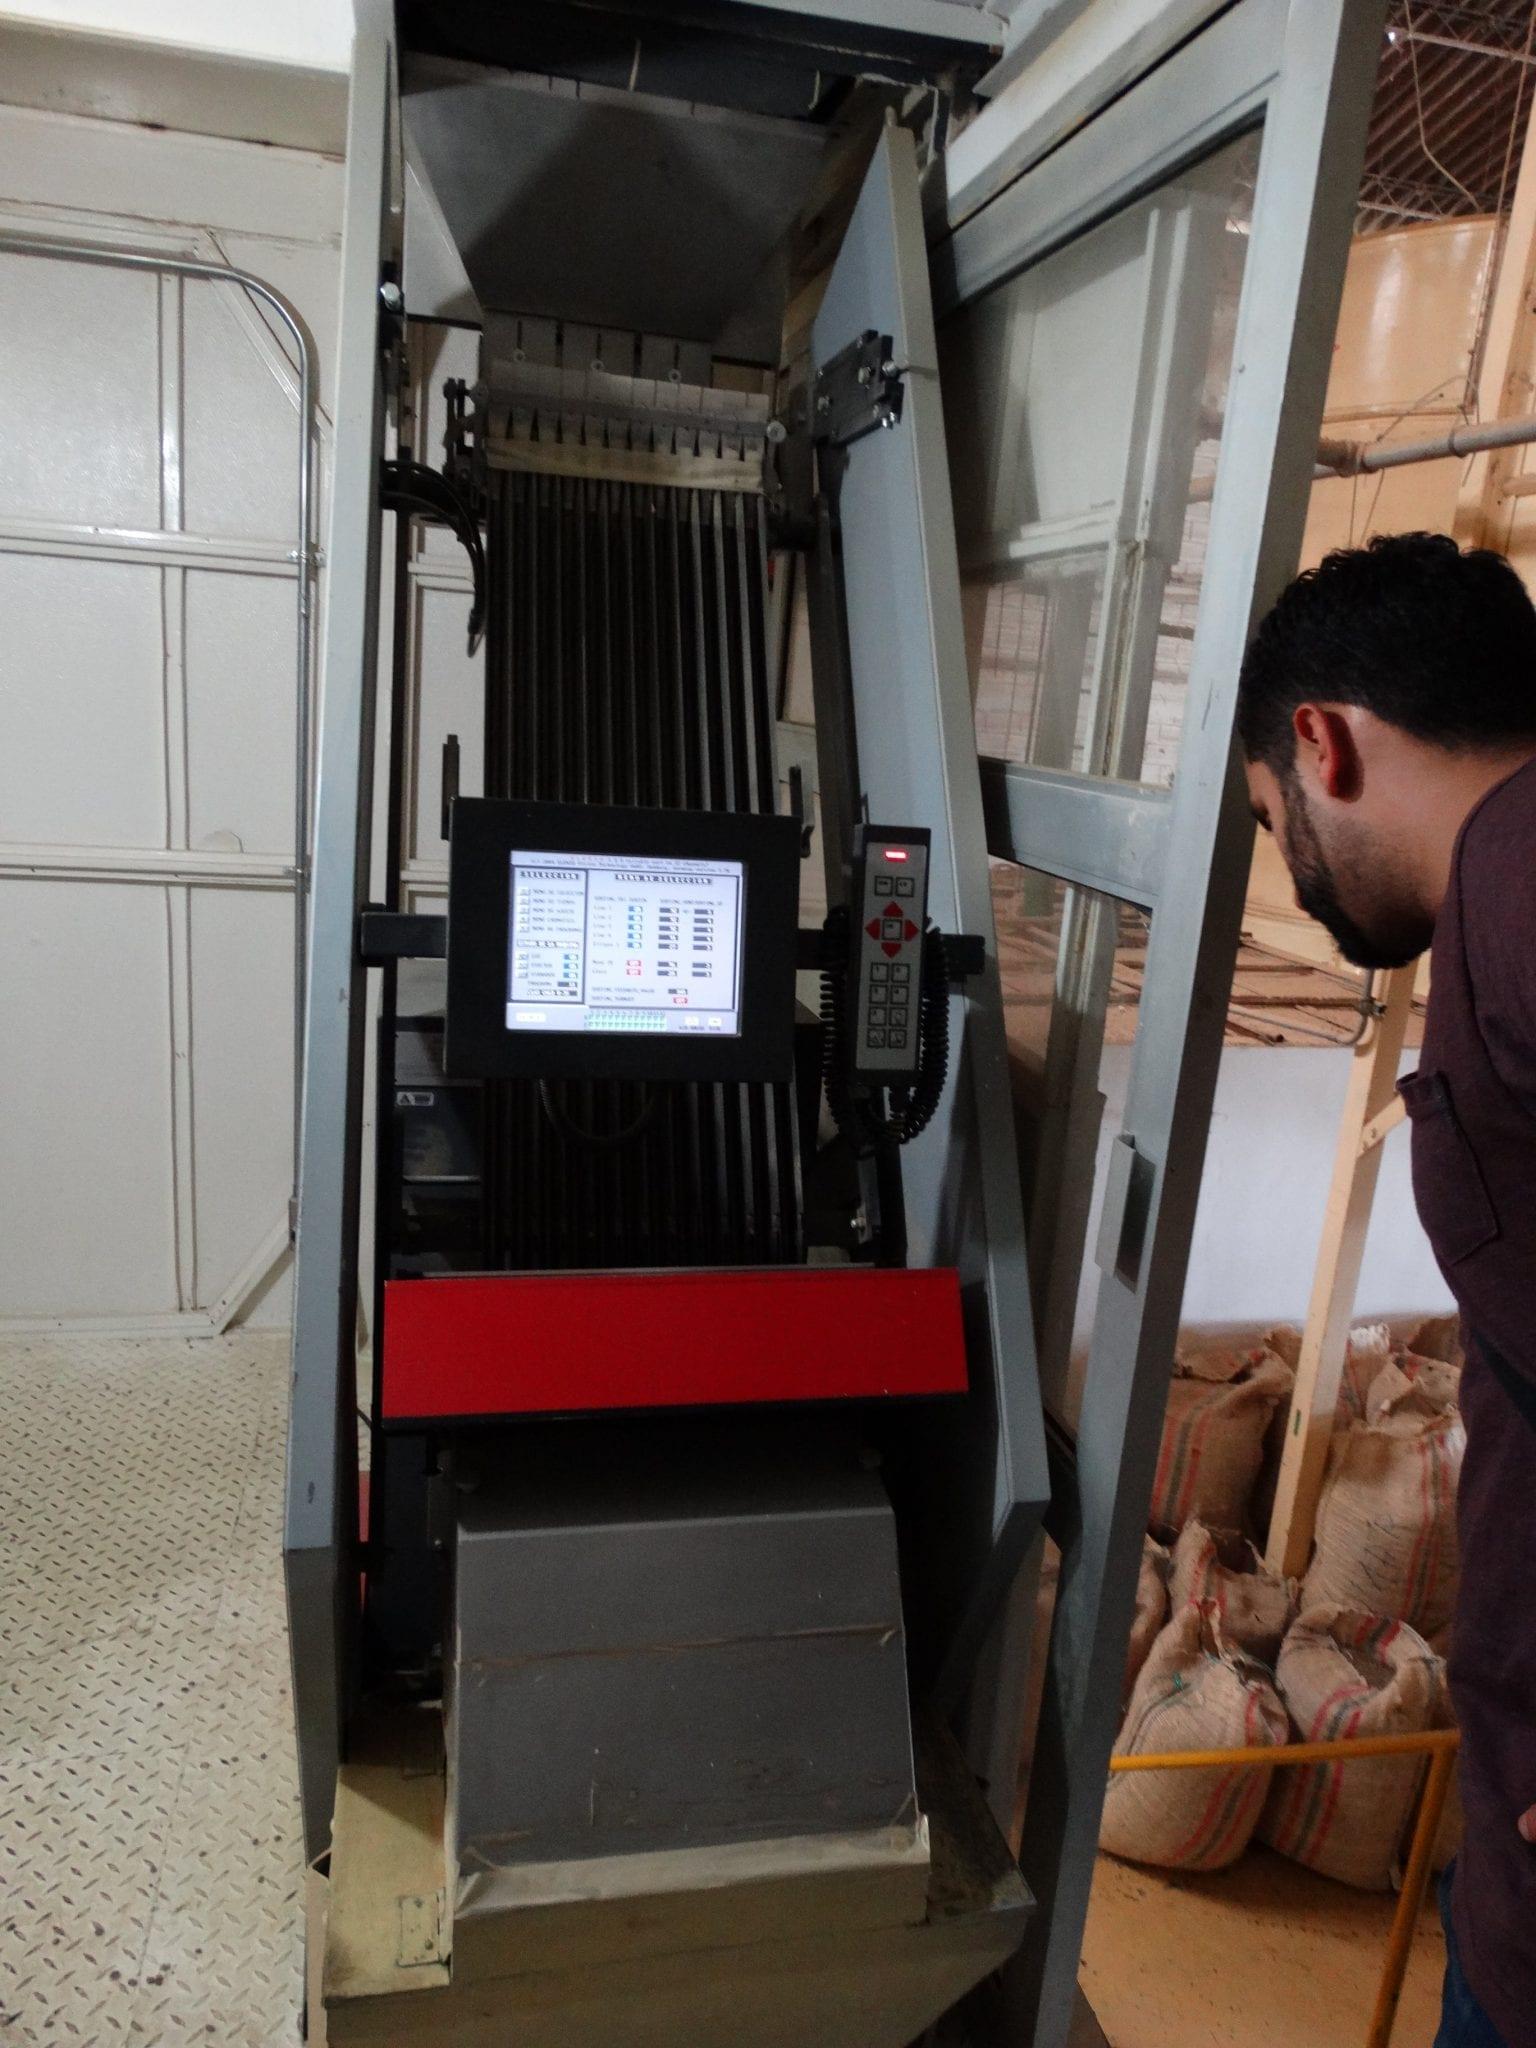 Coffee sorting machine